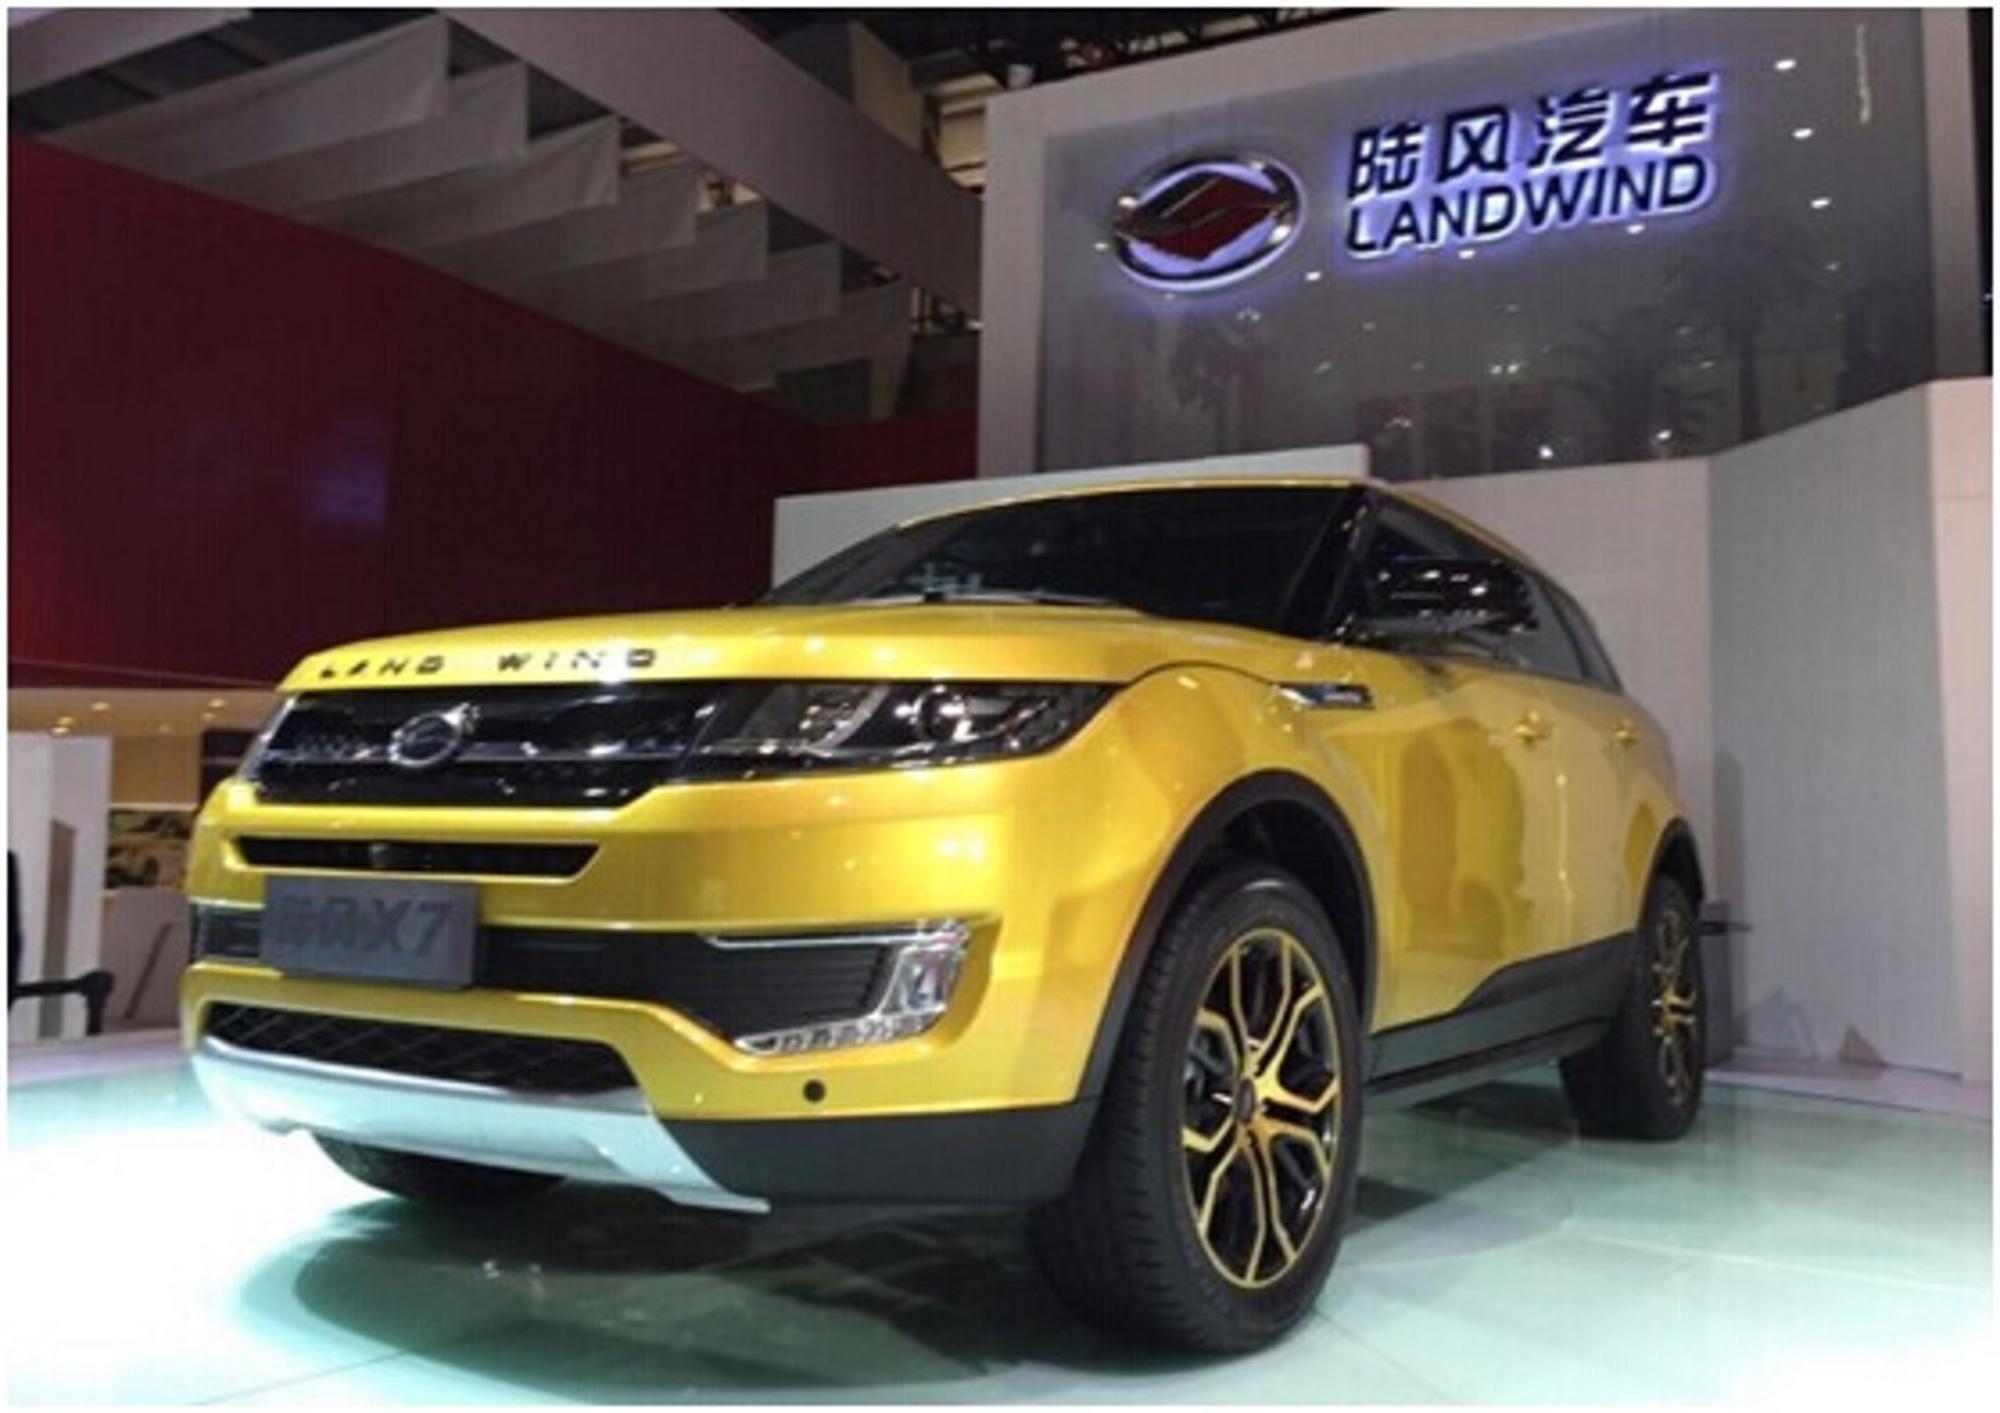 Landwind X7 - Billig-Range-Rover aus China